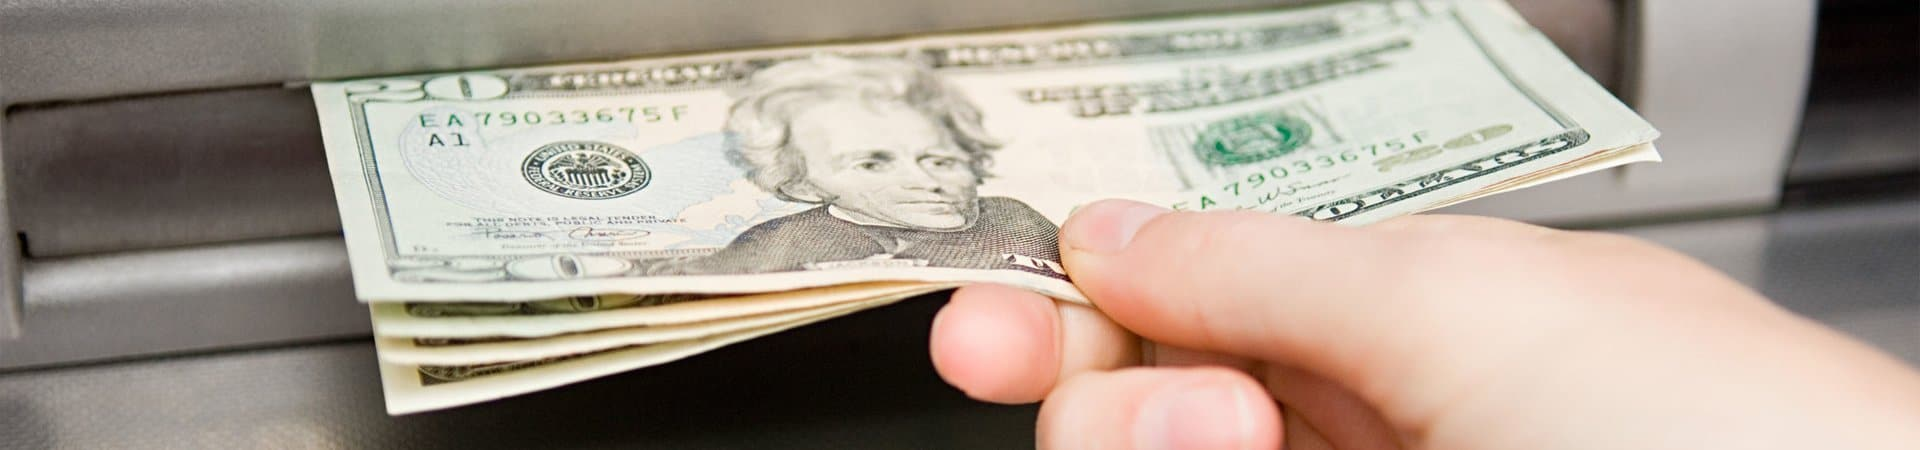 Hand Holding ATM America Profits